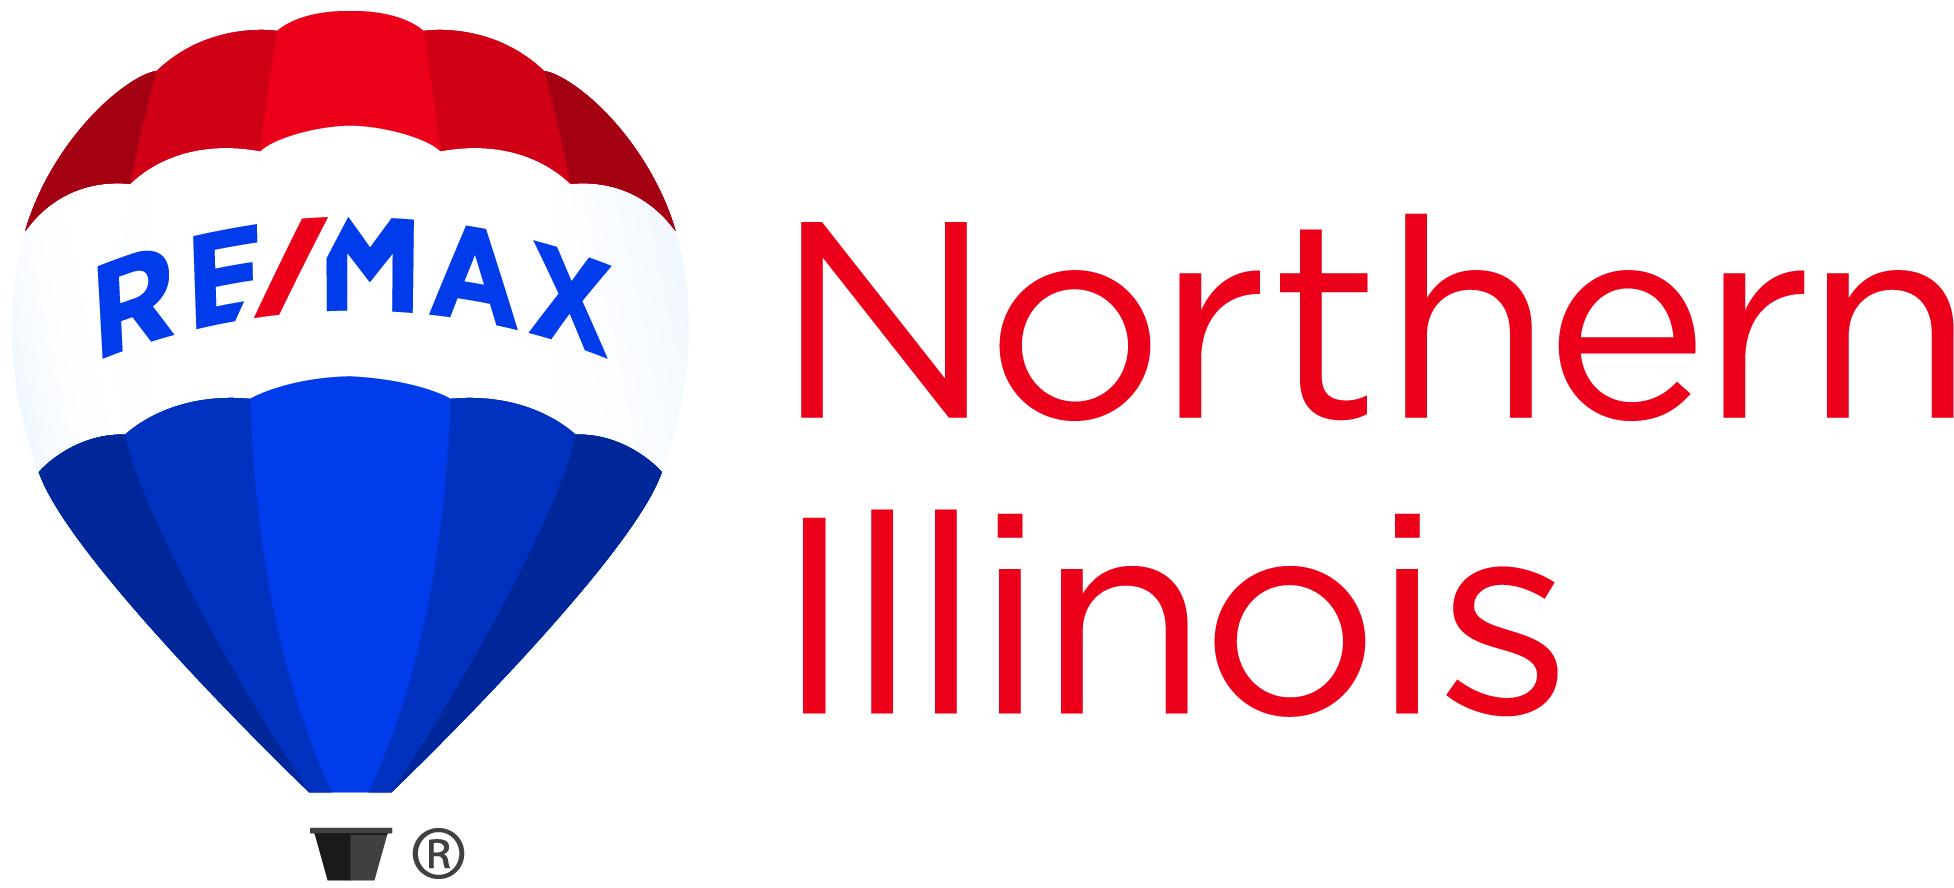 RE/MAX Northern Illinois Logo